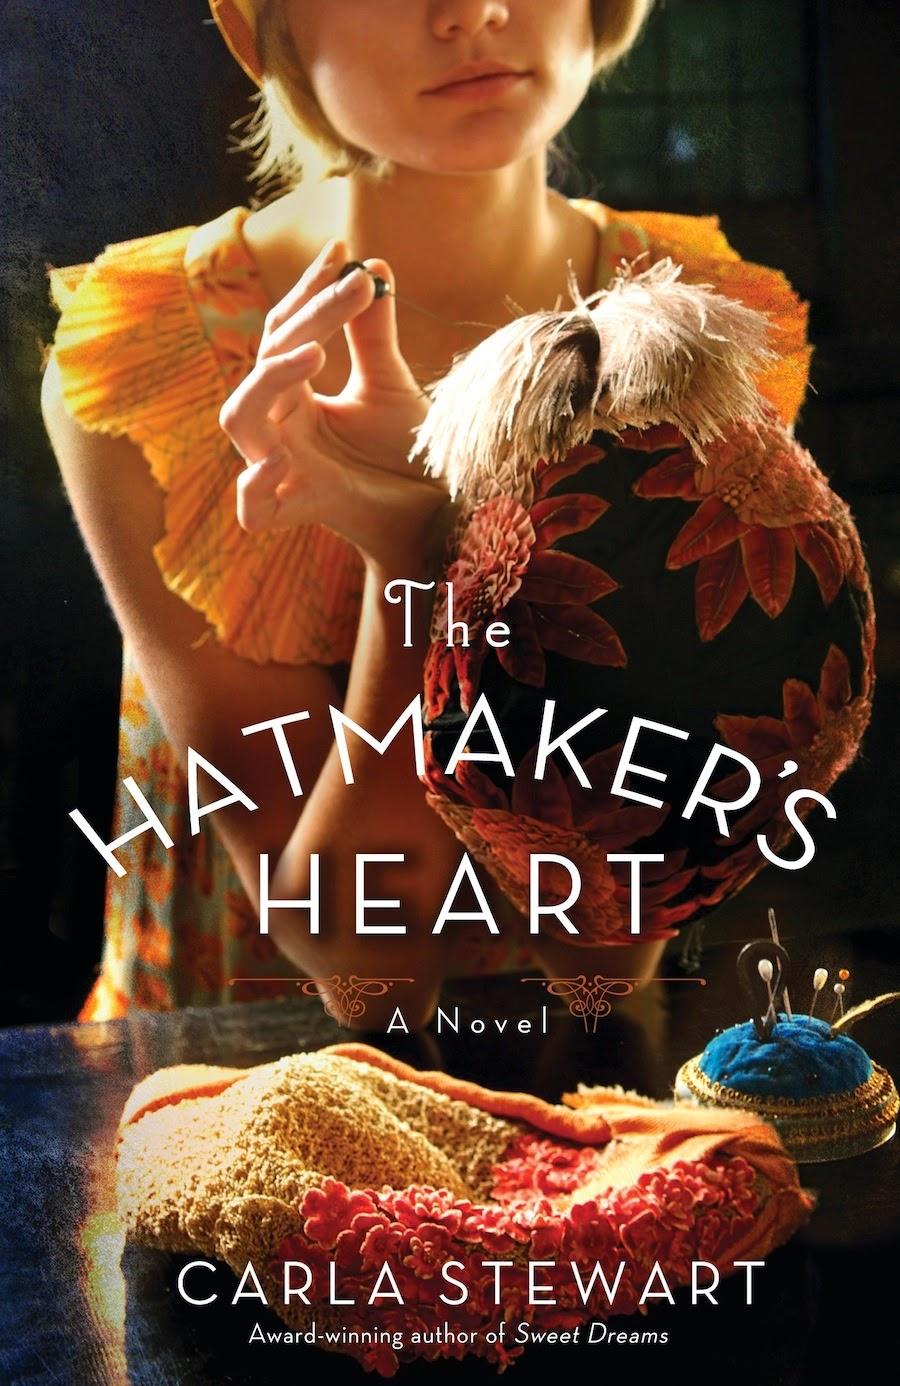 http://www.amazon.com/The-Hatmakers-Heart-A-Novel/dp/1455549940/ref=tmm_pap_title_0